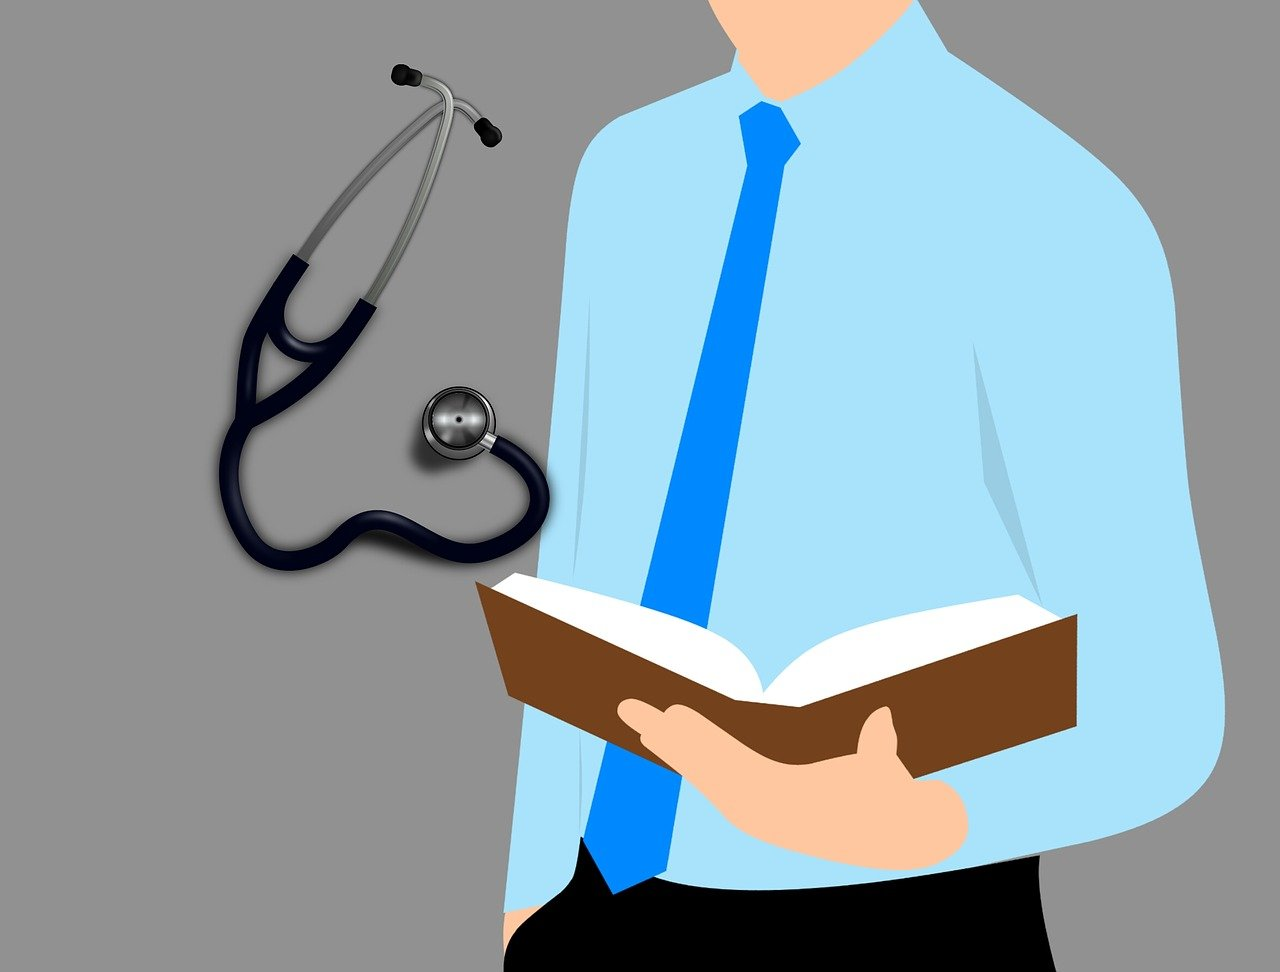 doctors-3268434_1280.jpg